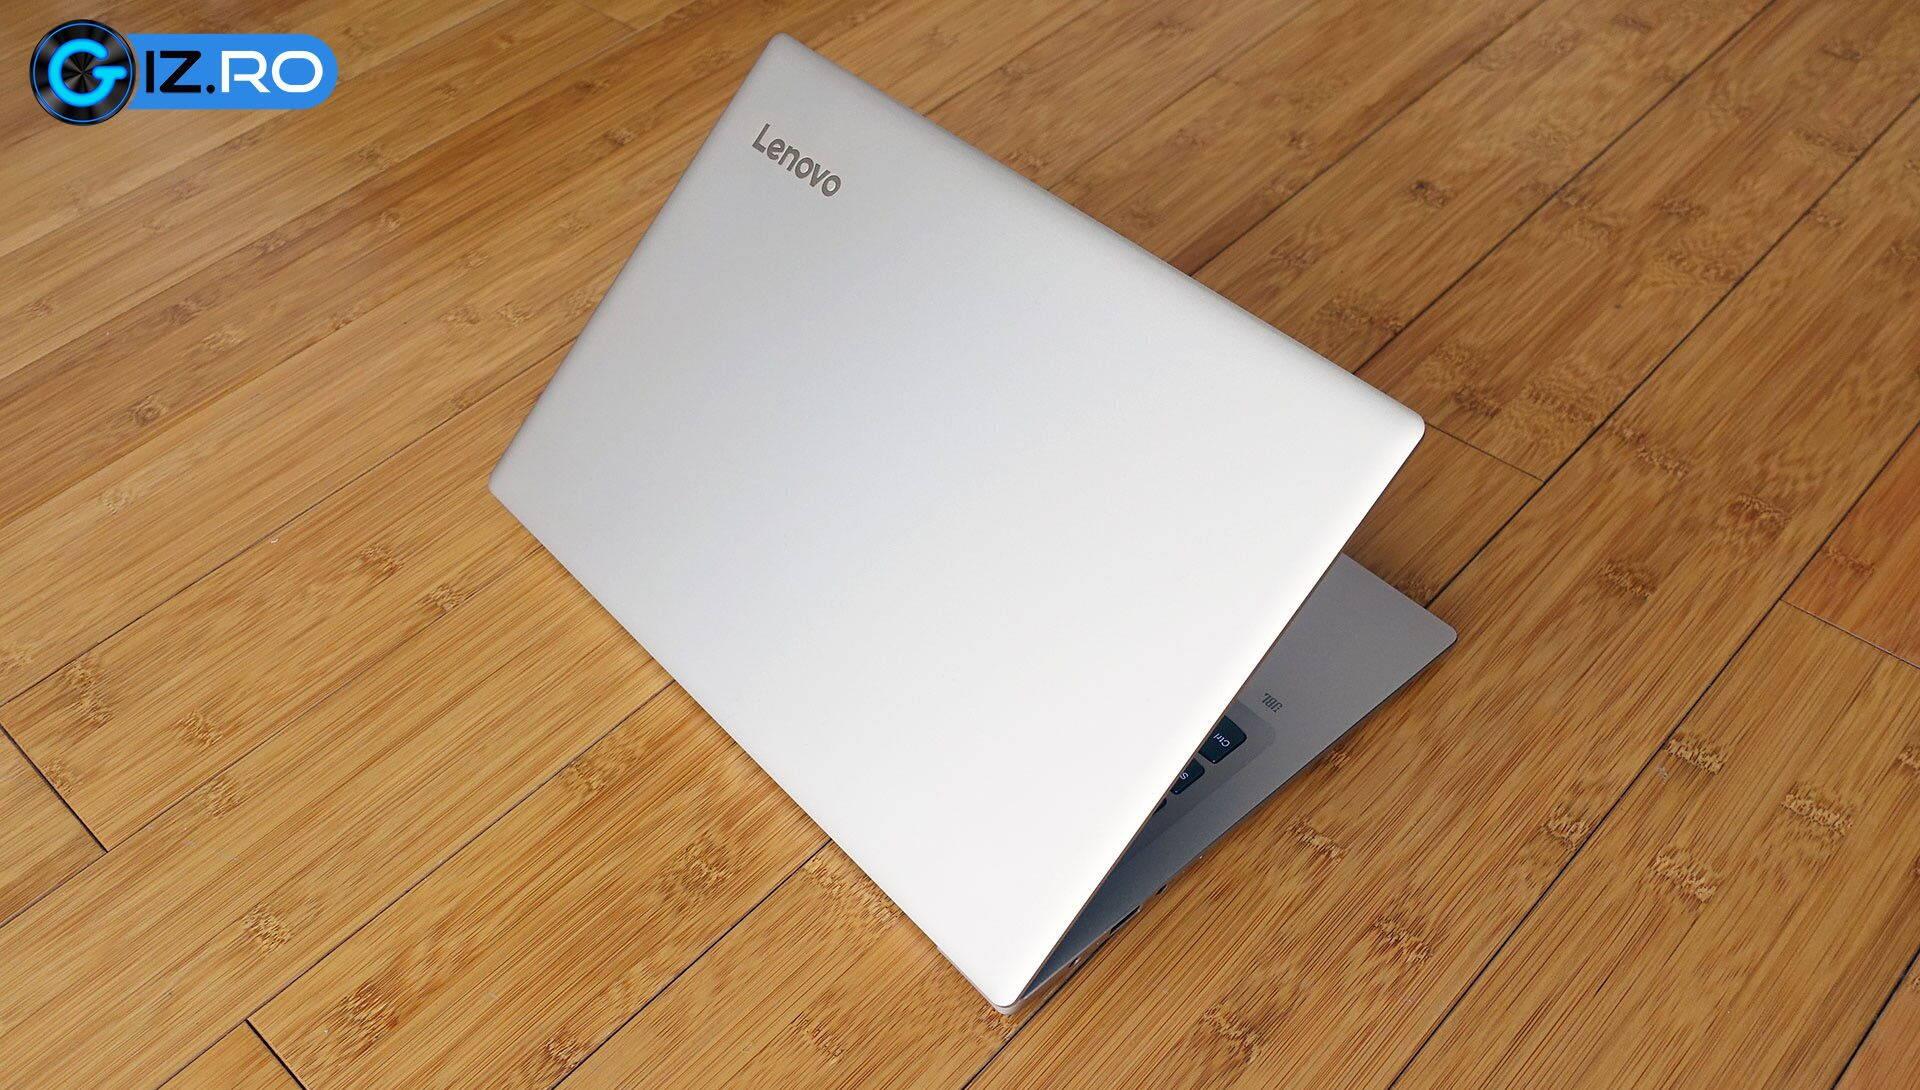 lenovo-ideapad-720s-design-exterior1